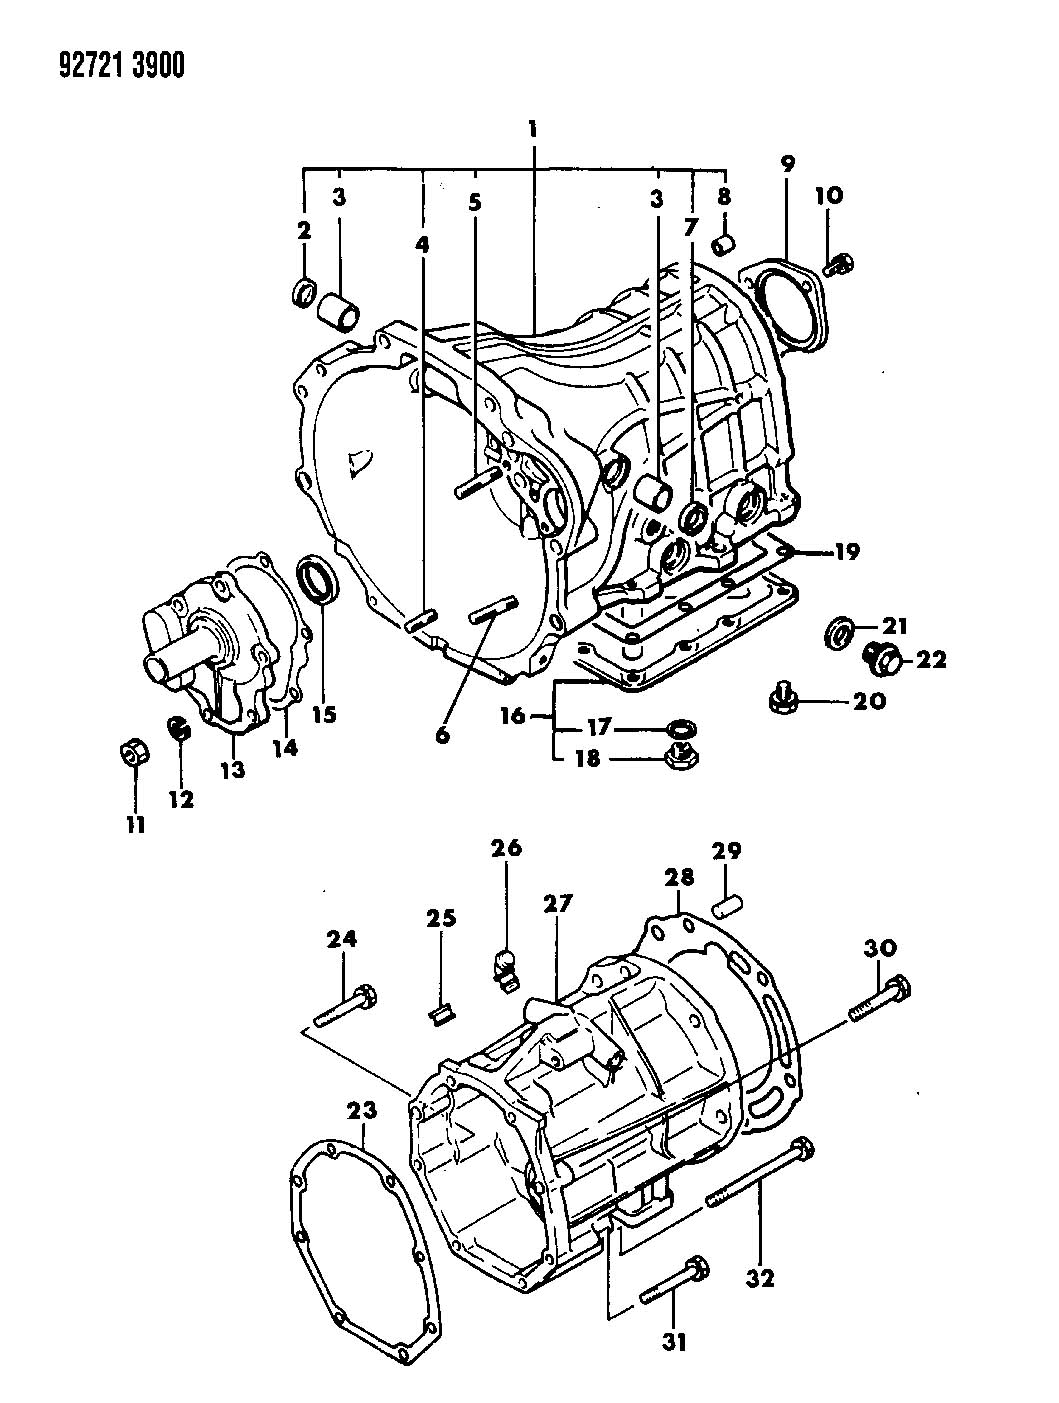 Jeep Patriot Gasket Drain Plug